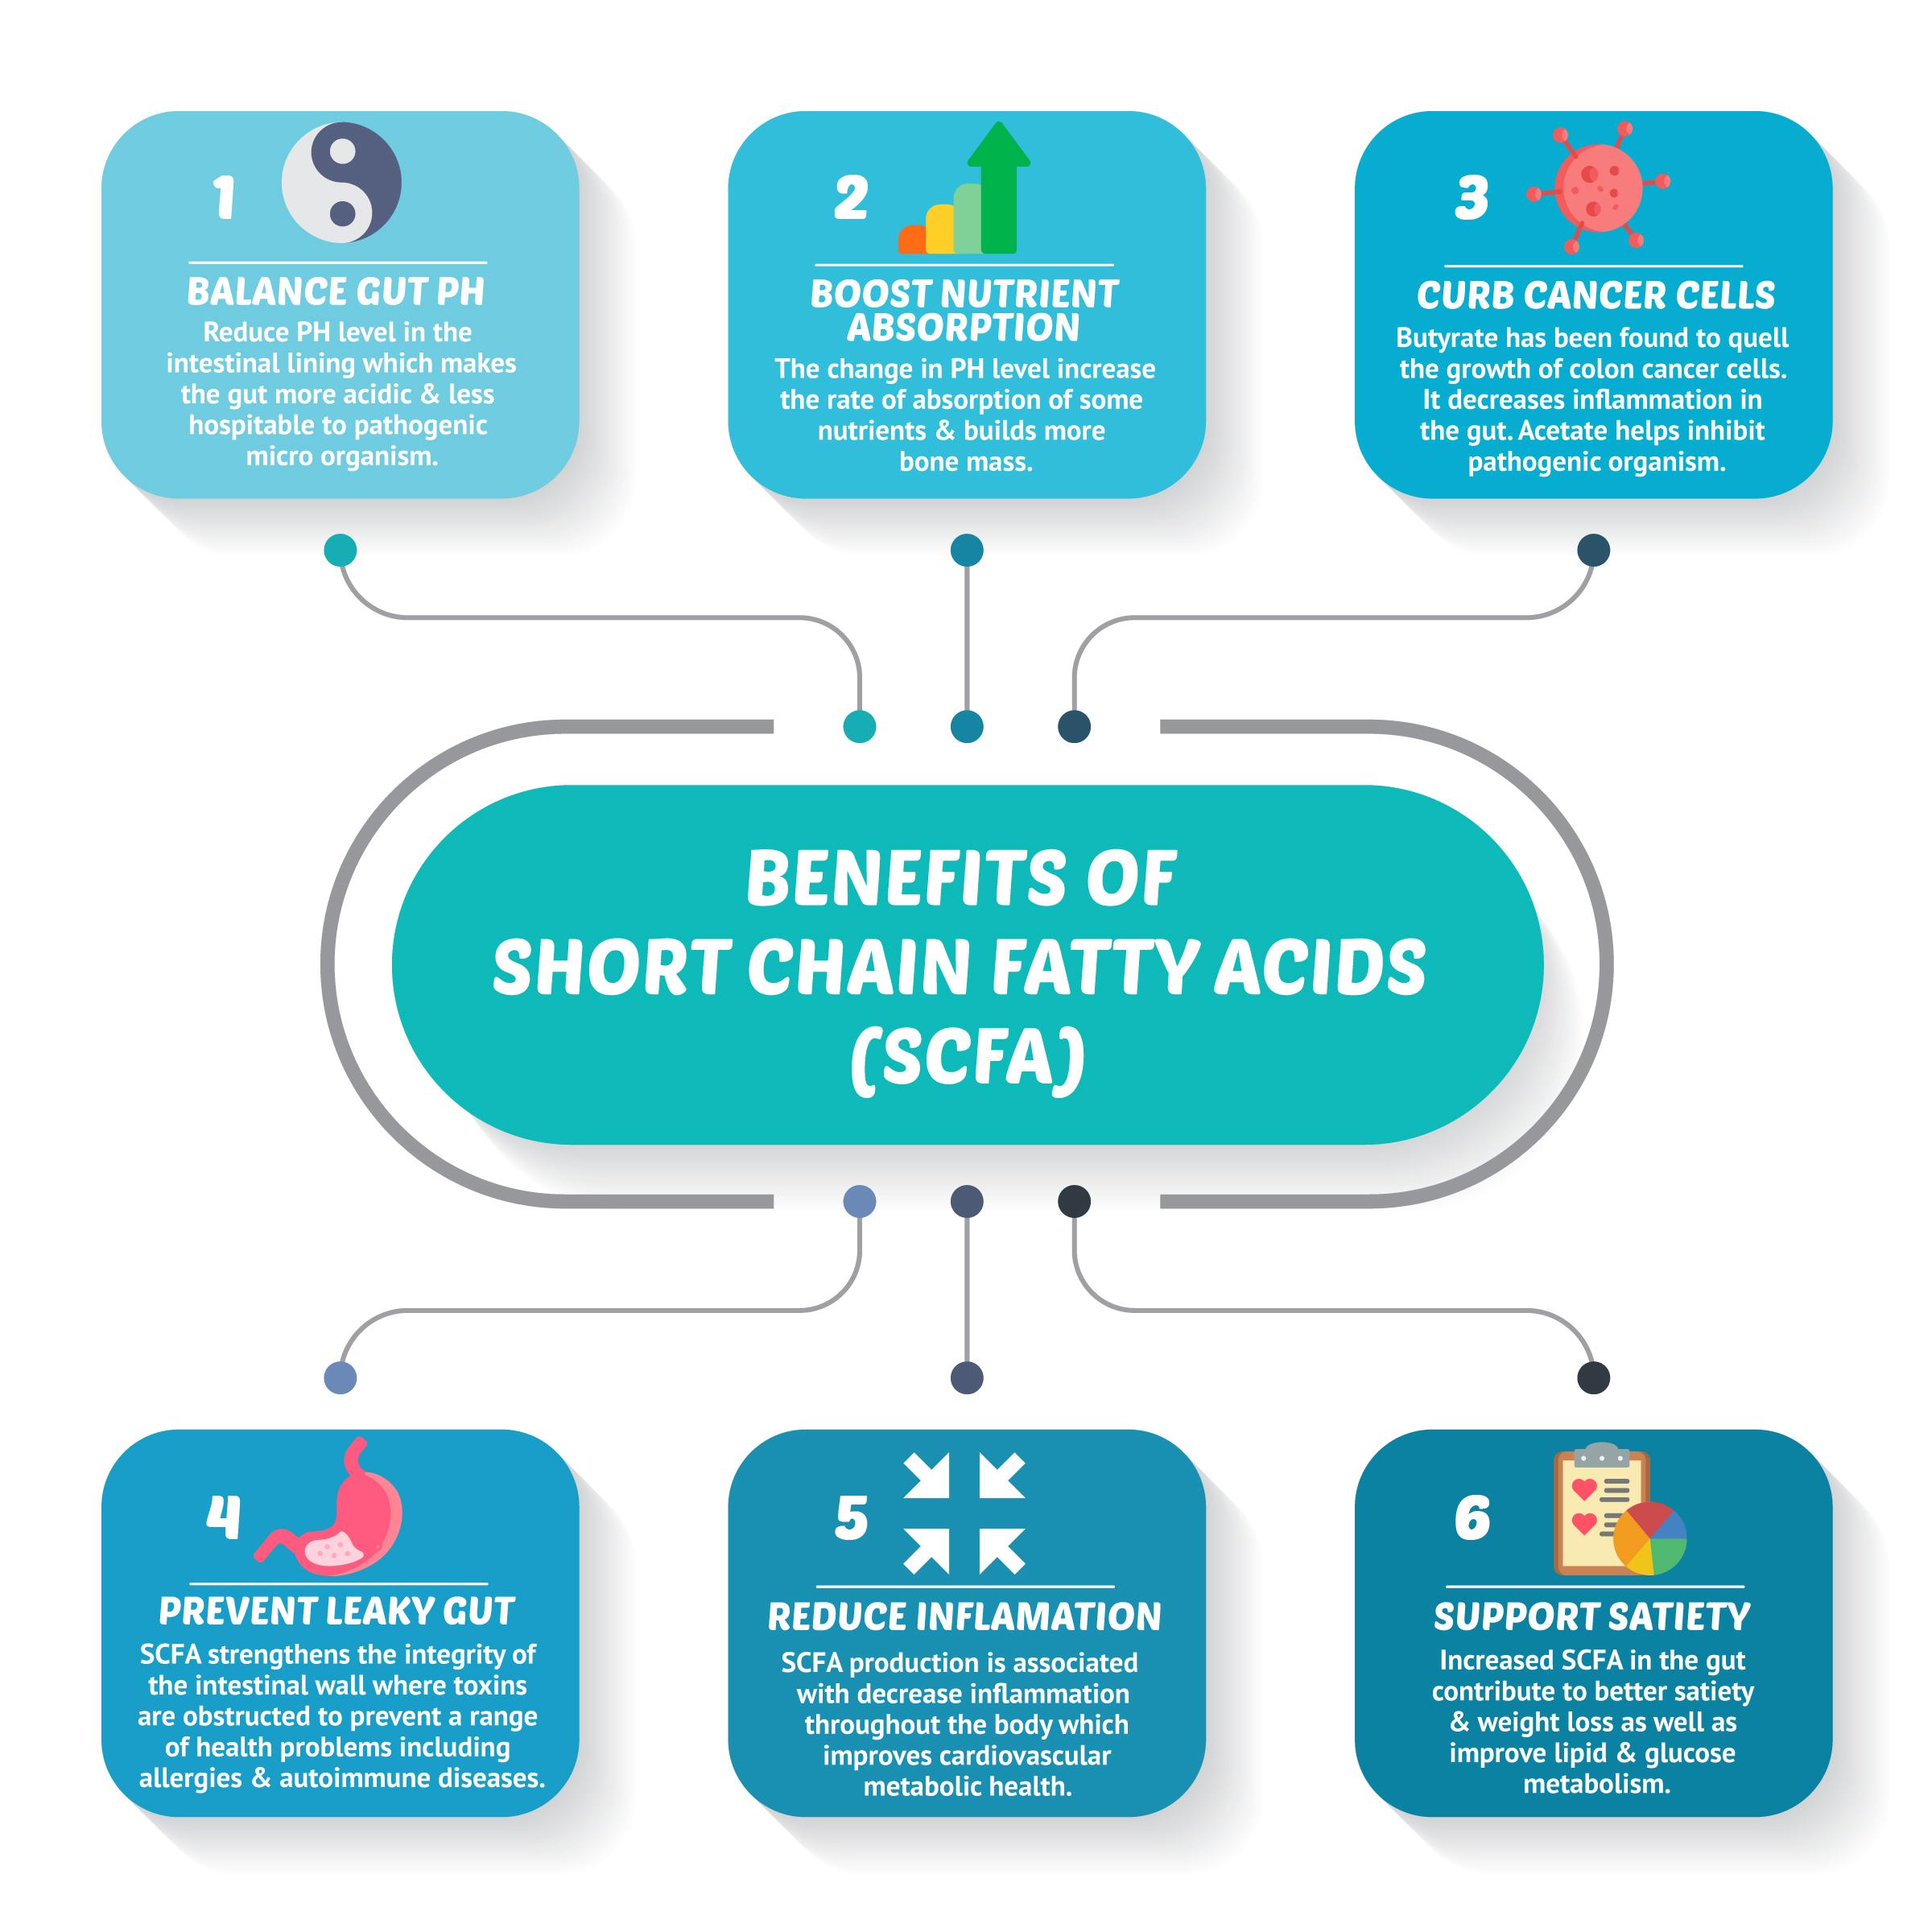 benefis of short chain fatty acids